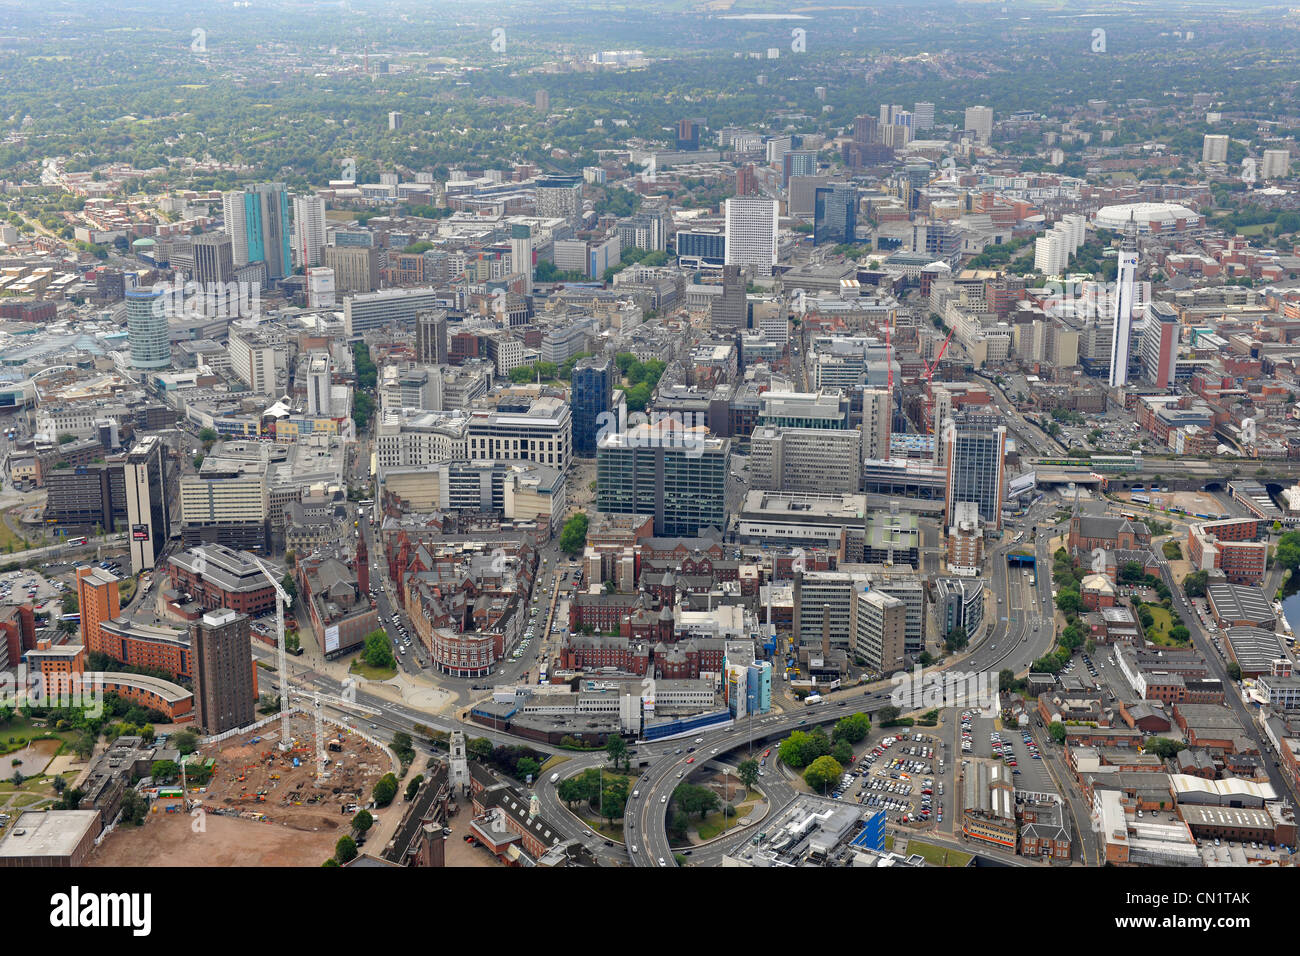 Birmingham City Centre Aerial View Stock Photo